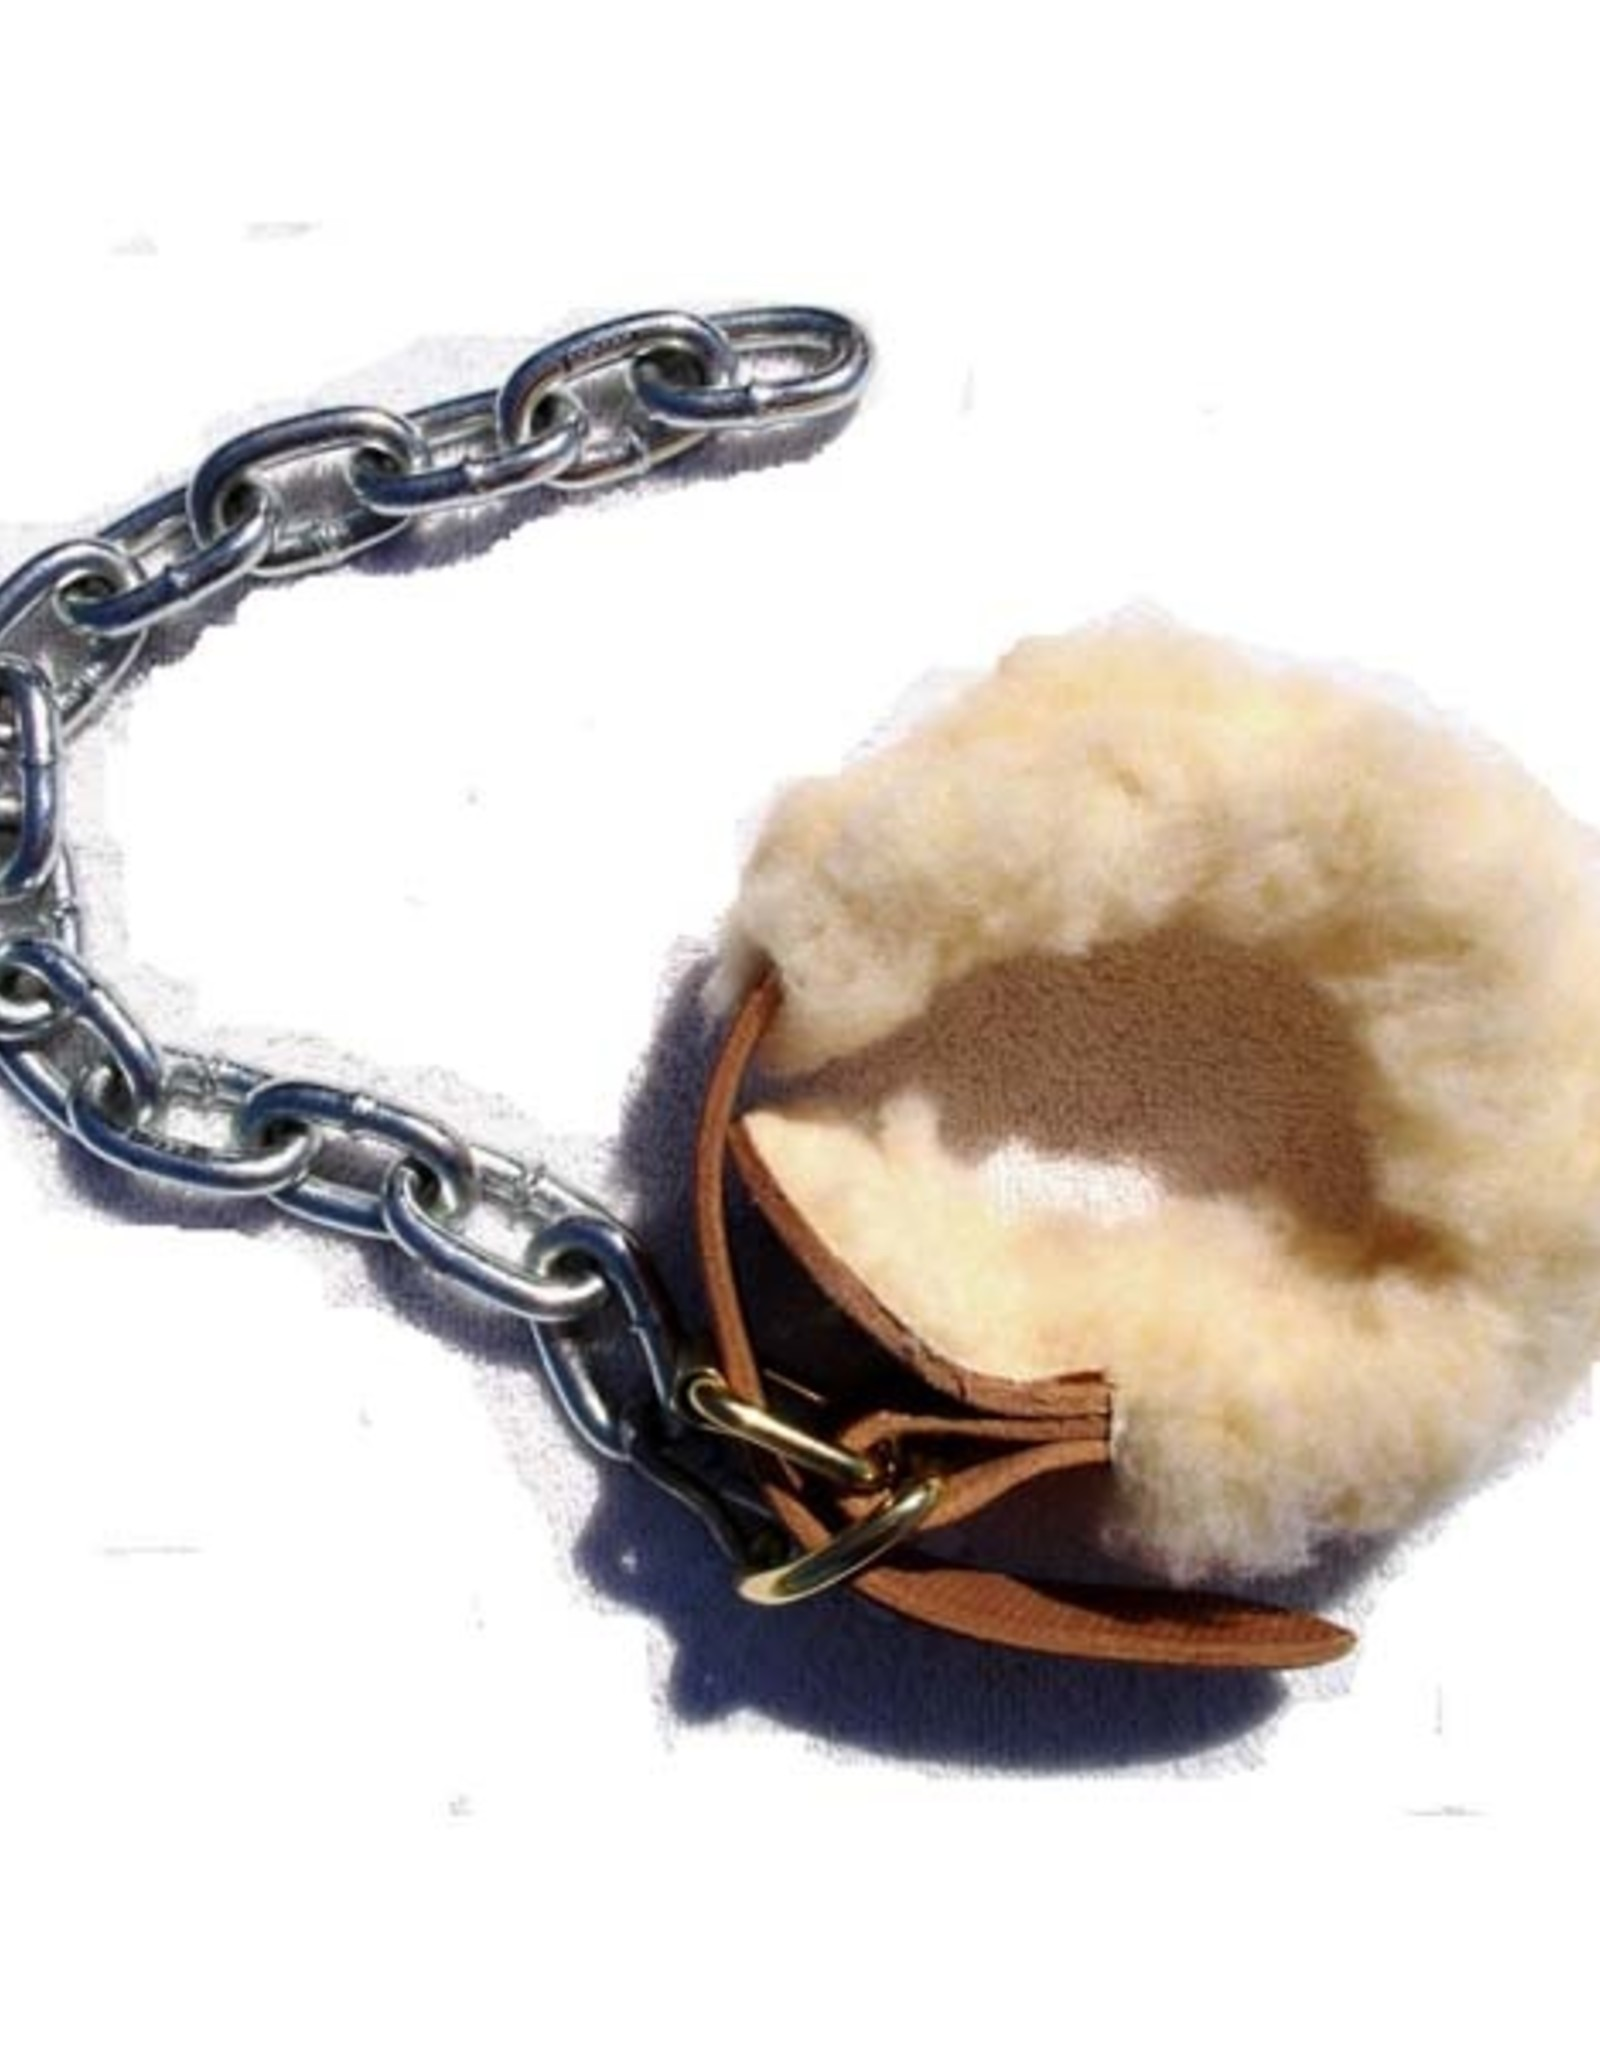 Sheepskin Lined Leather Kicking Chain